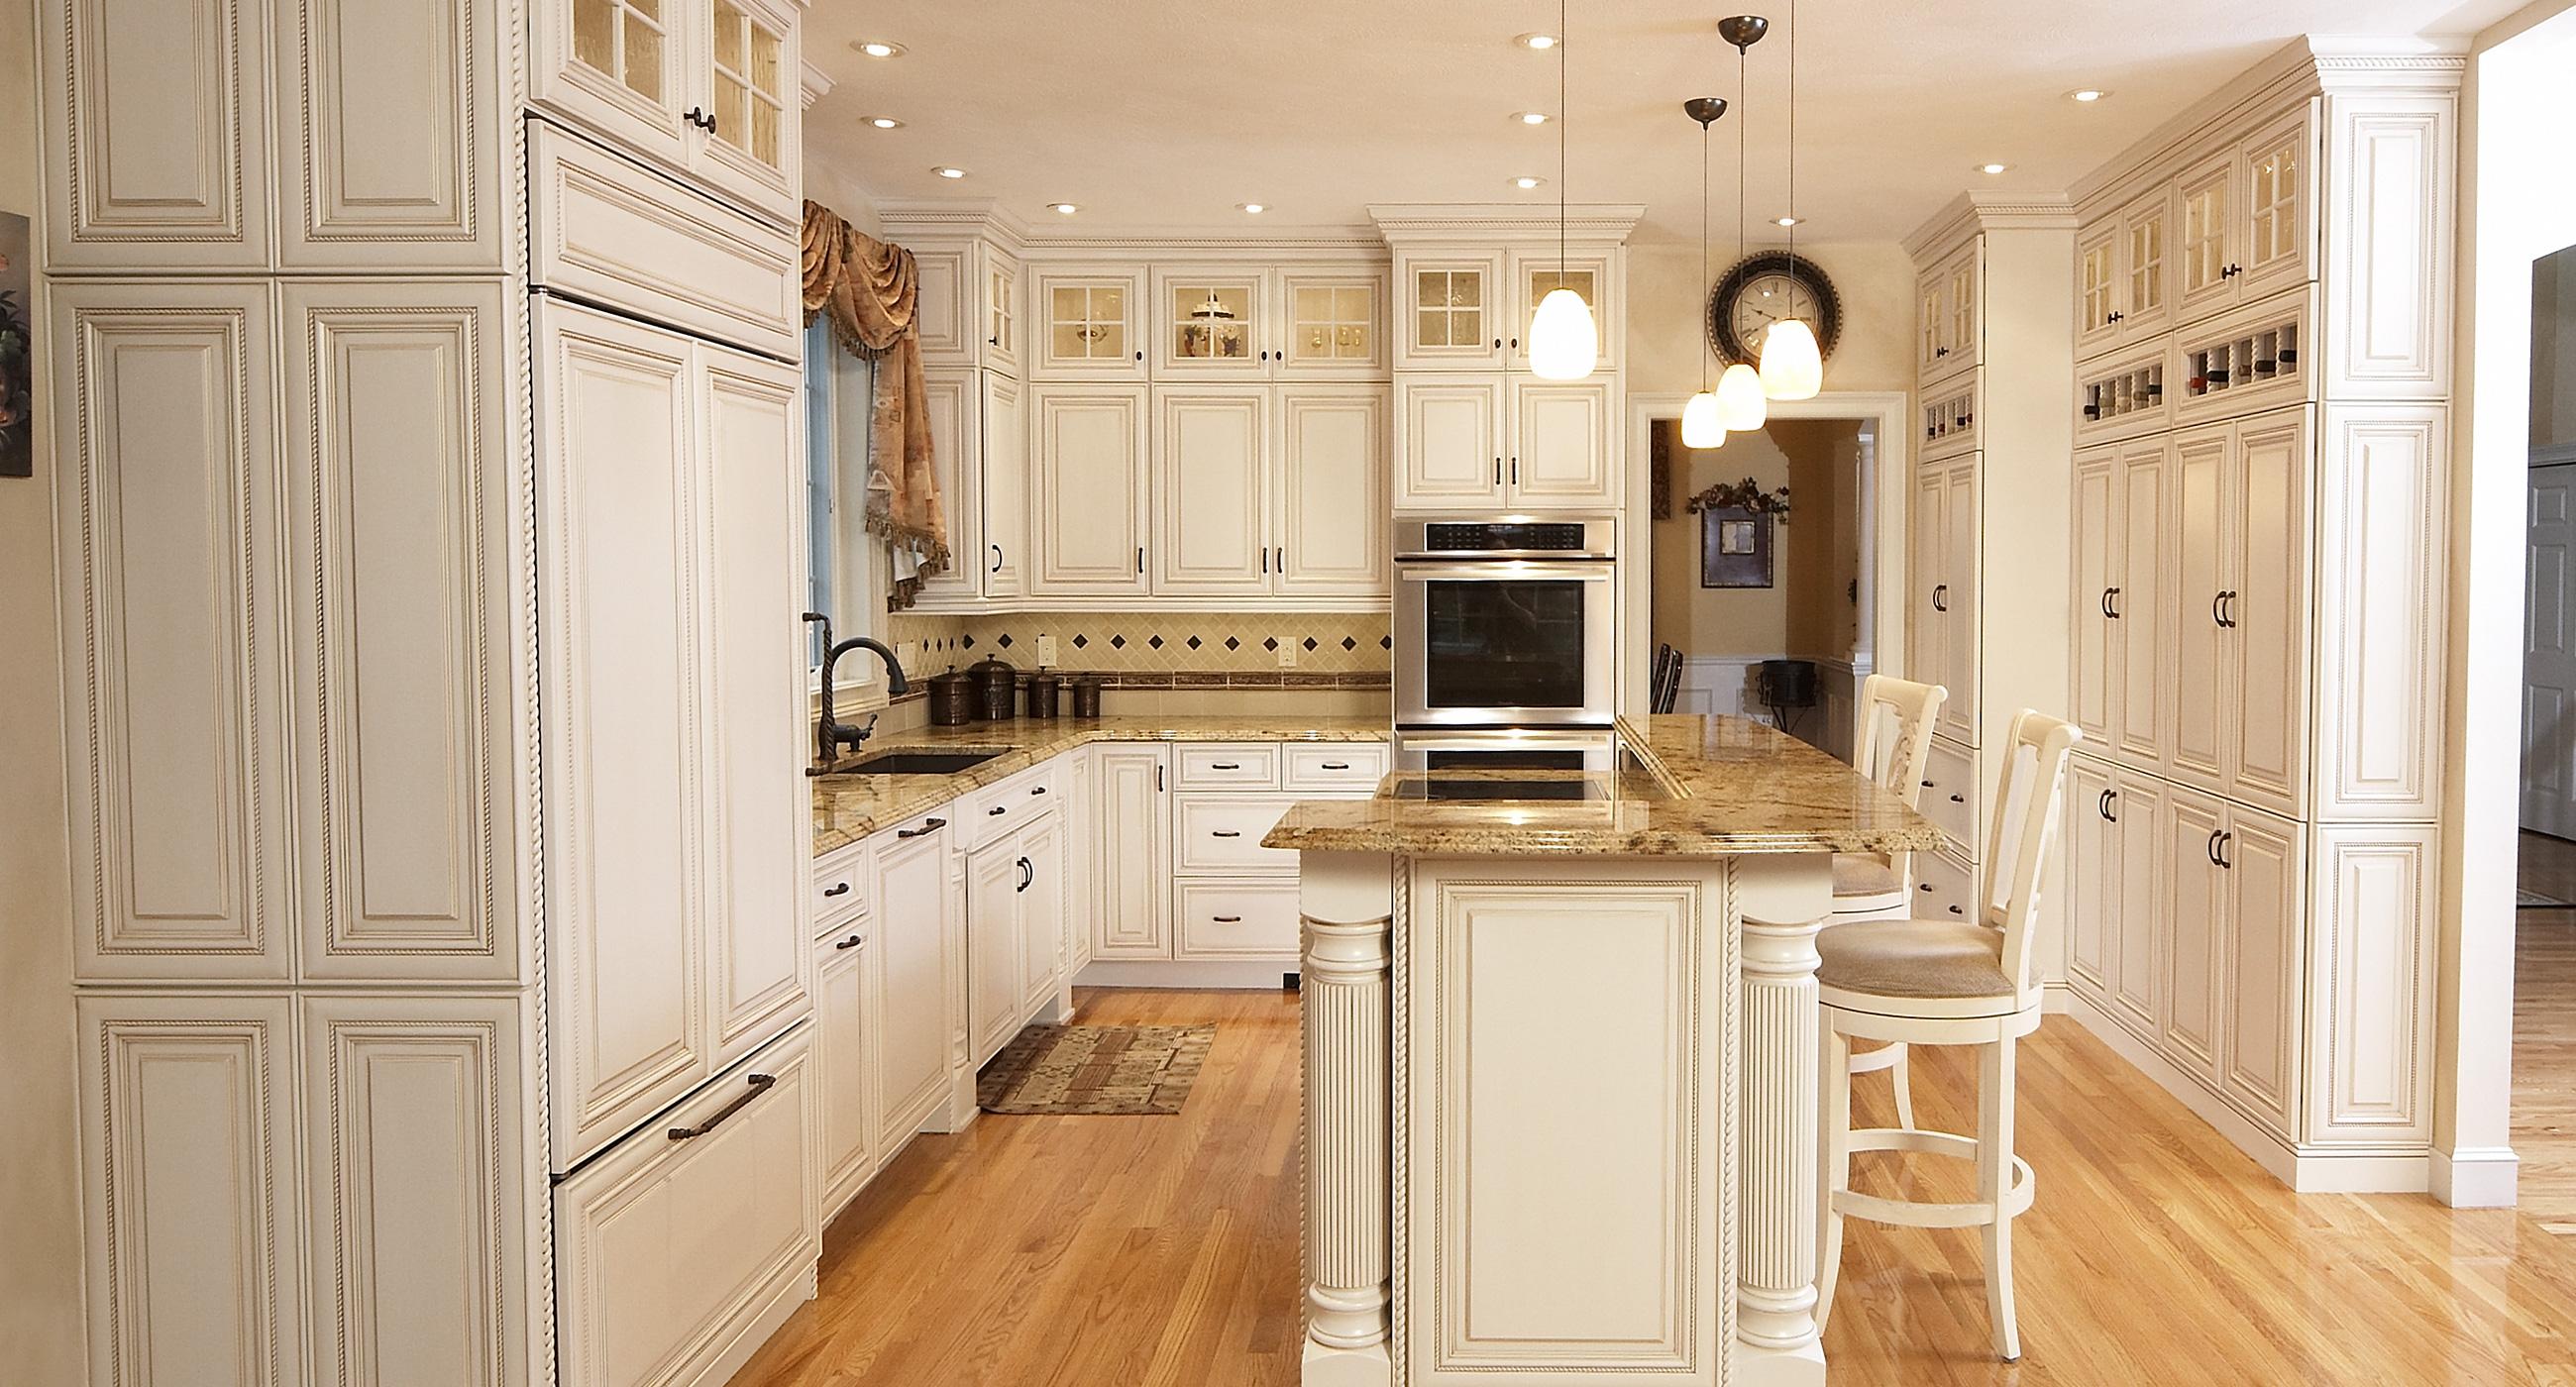 Front White Kitchen Built-in Refrigerator